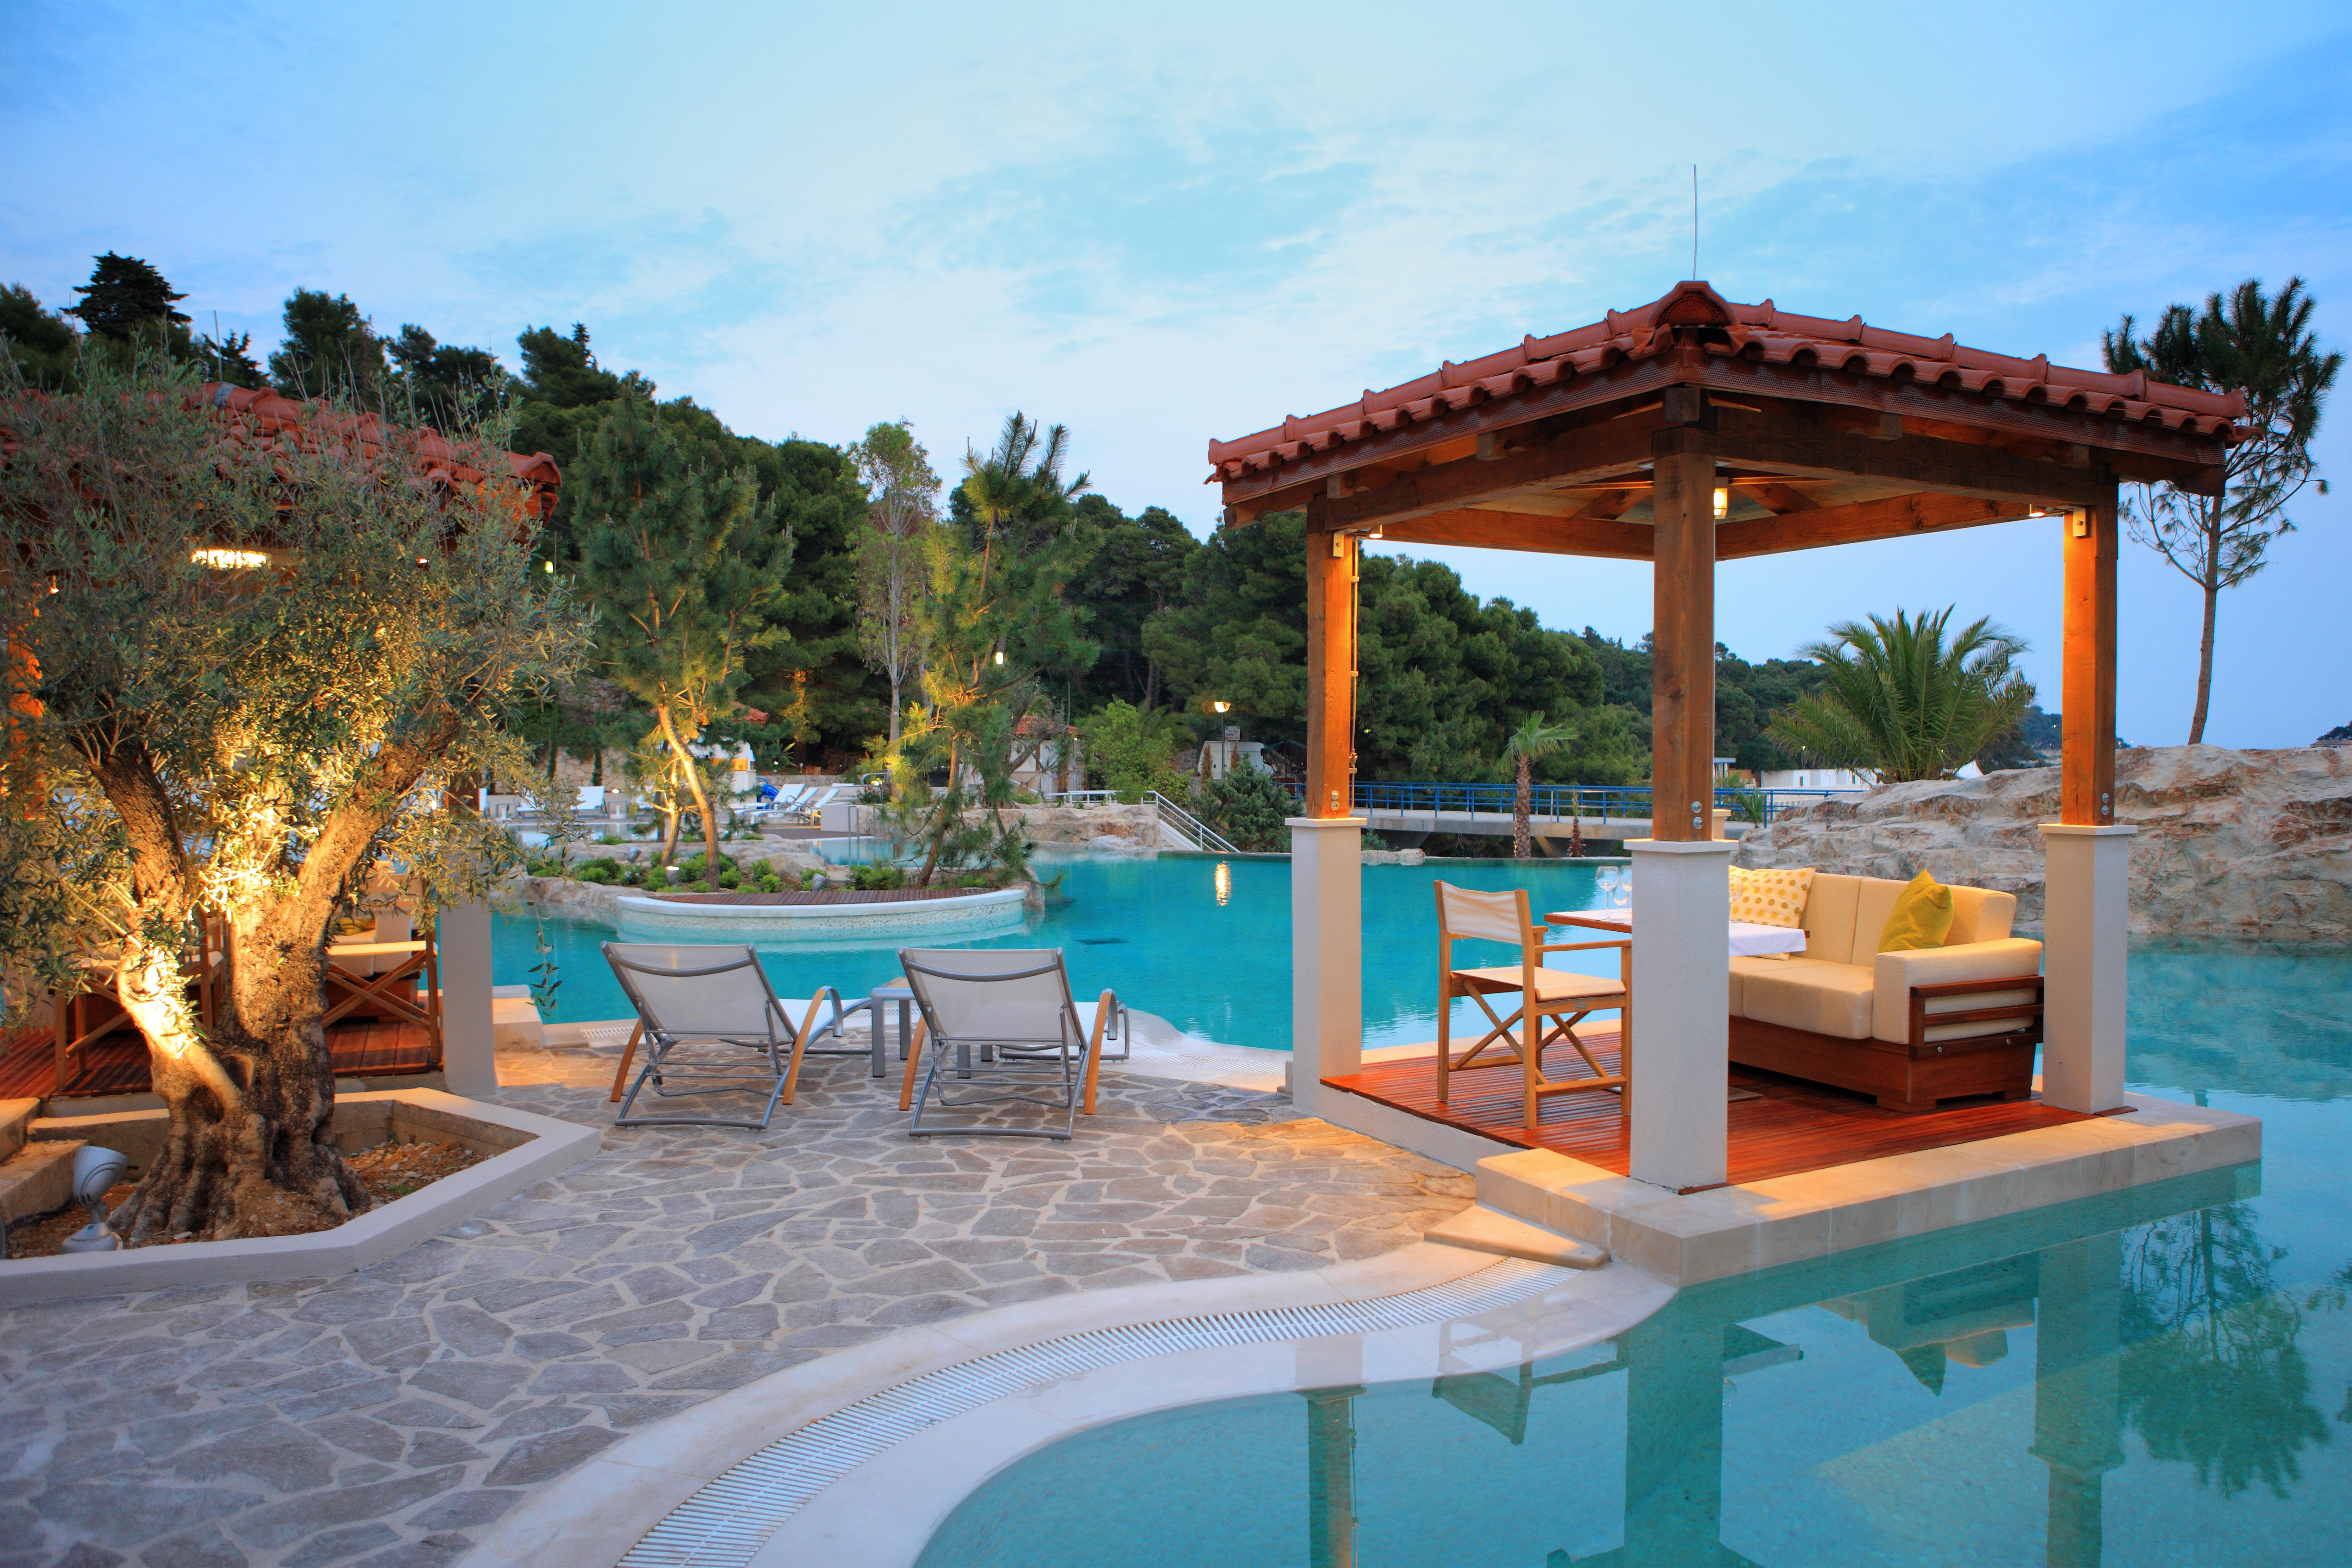 amfora hvar grand beach resort picture gallery suncani. Black Bedroom Furniture Sets. Home Design Ideas